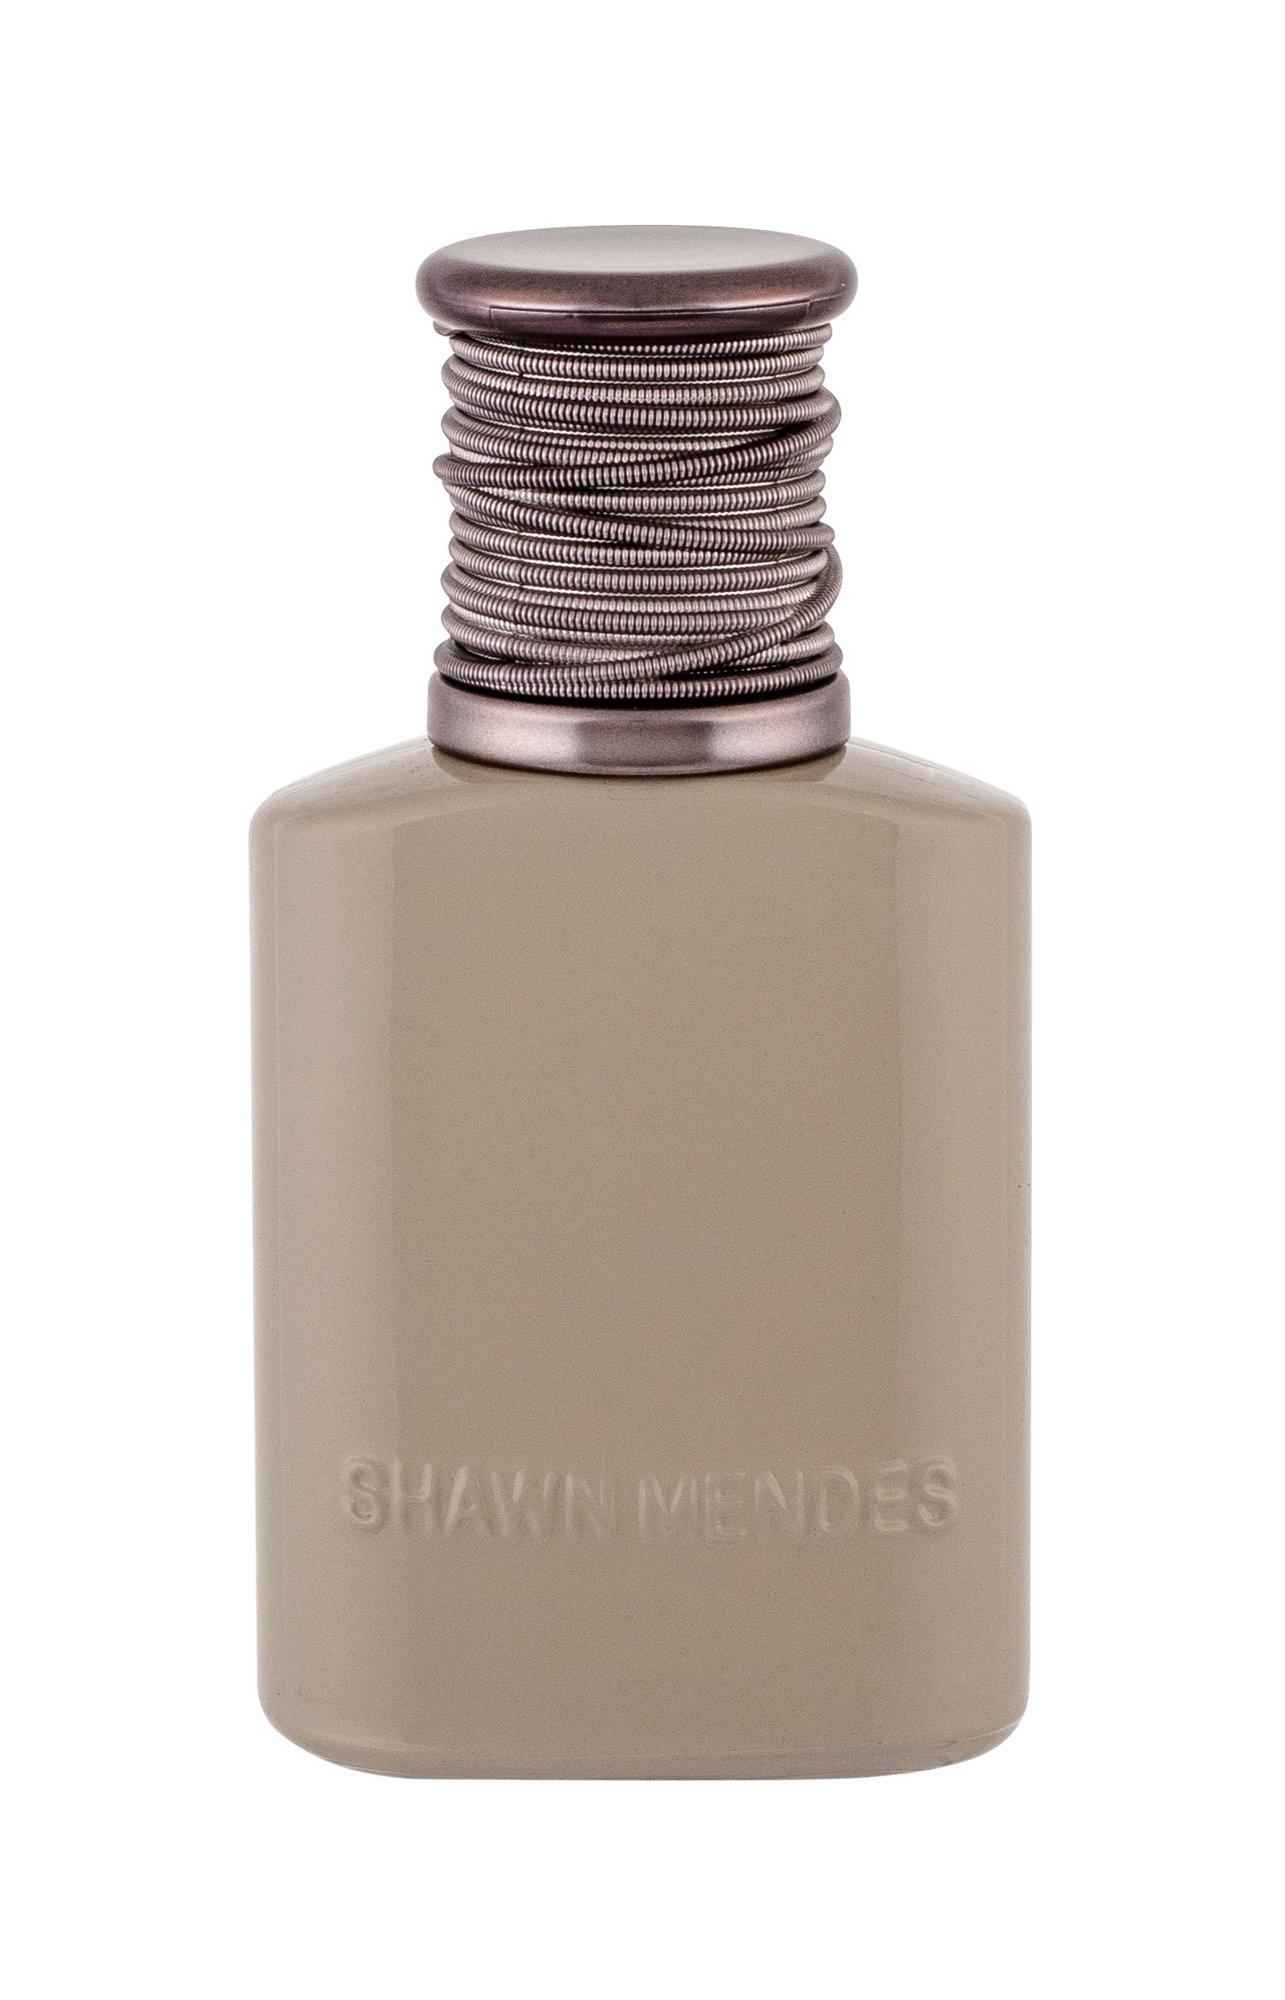 Kvepalai Shawn Mendes Signature II